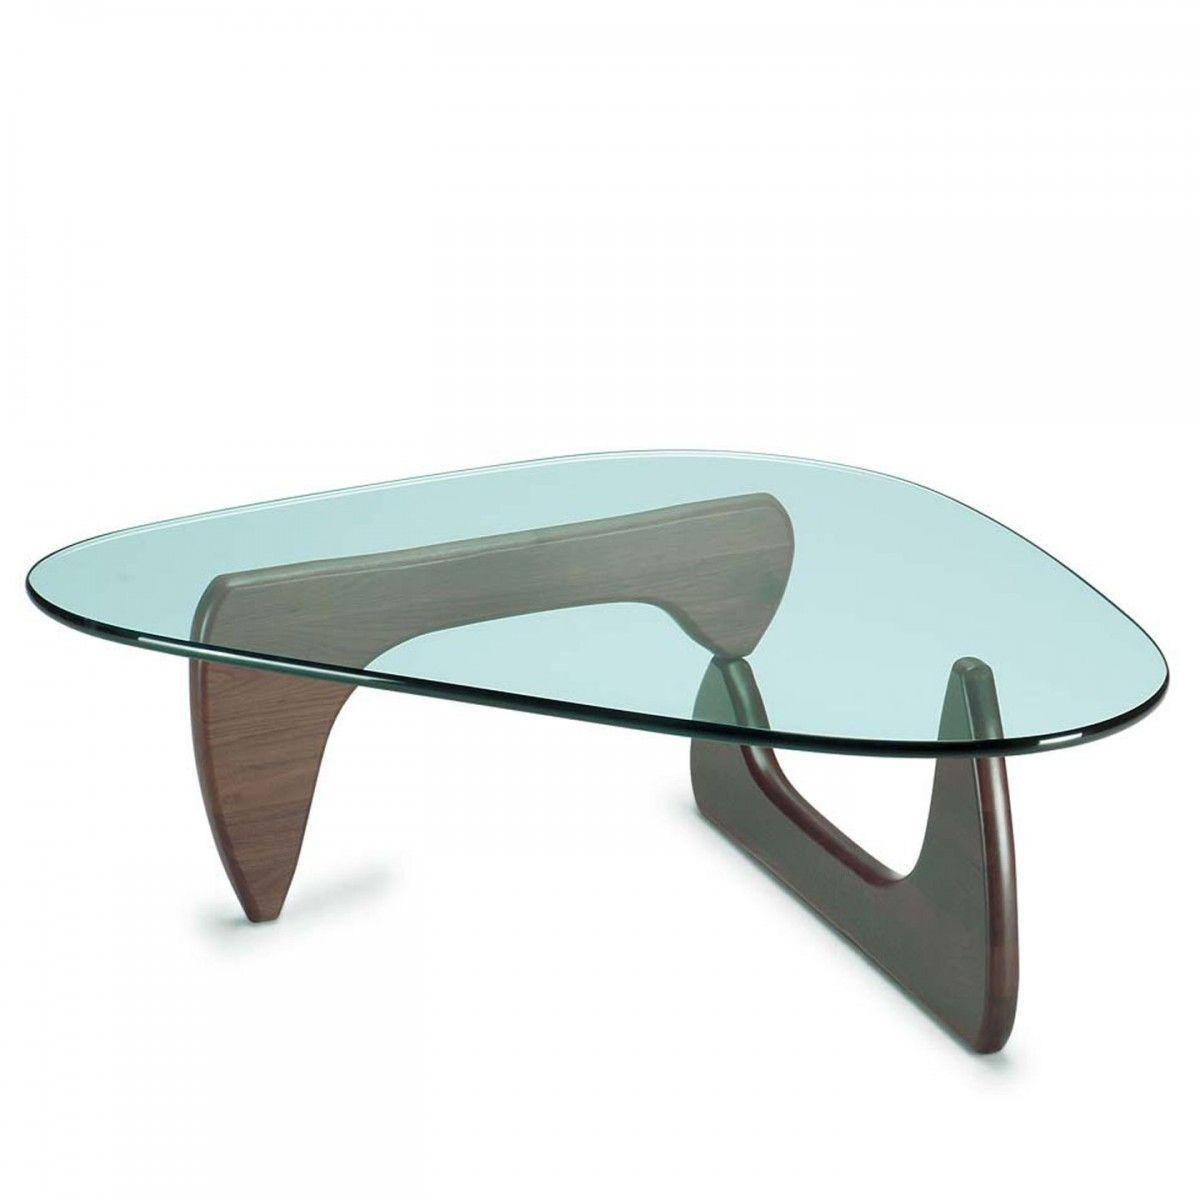 Noguchi Coffee Table Designer: Isamu Noguchi Brand: Vitra